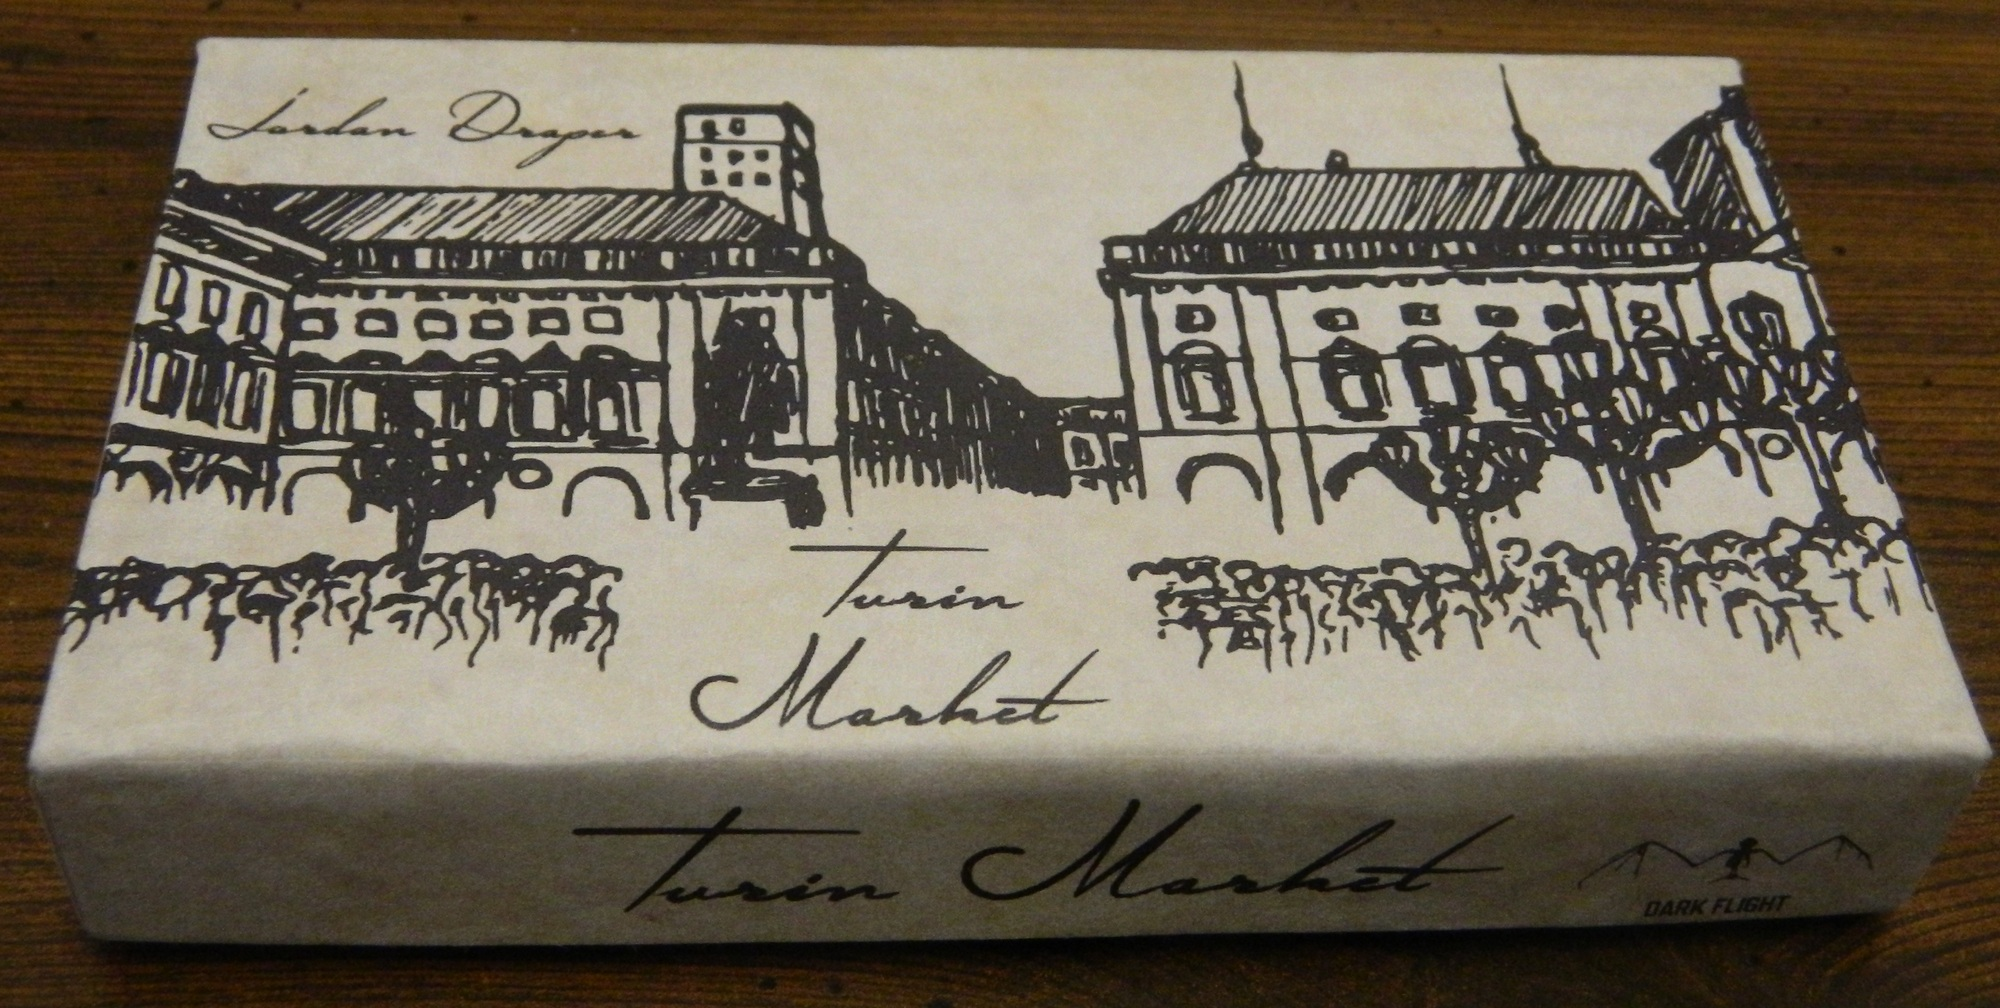 Box for Turin Market